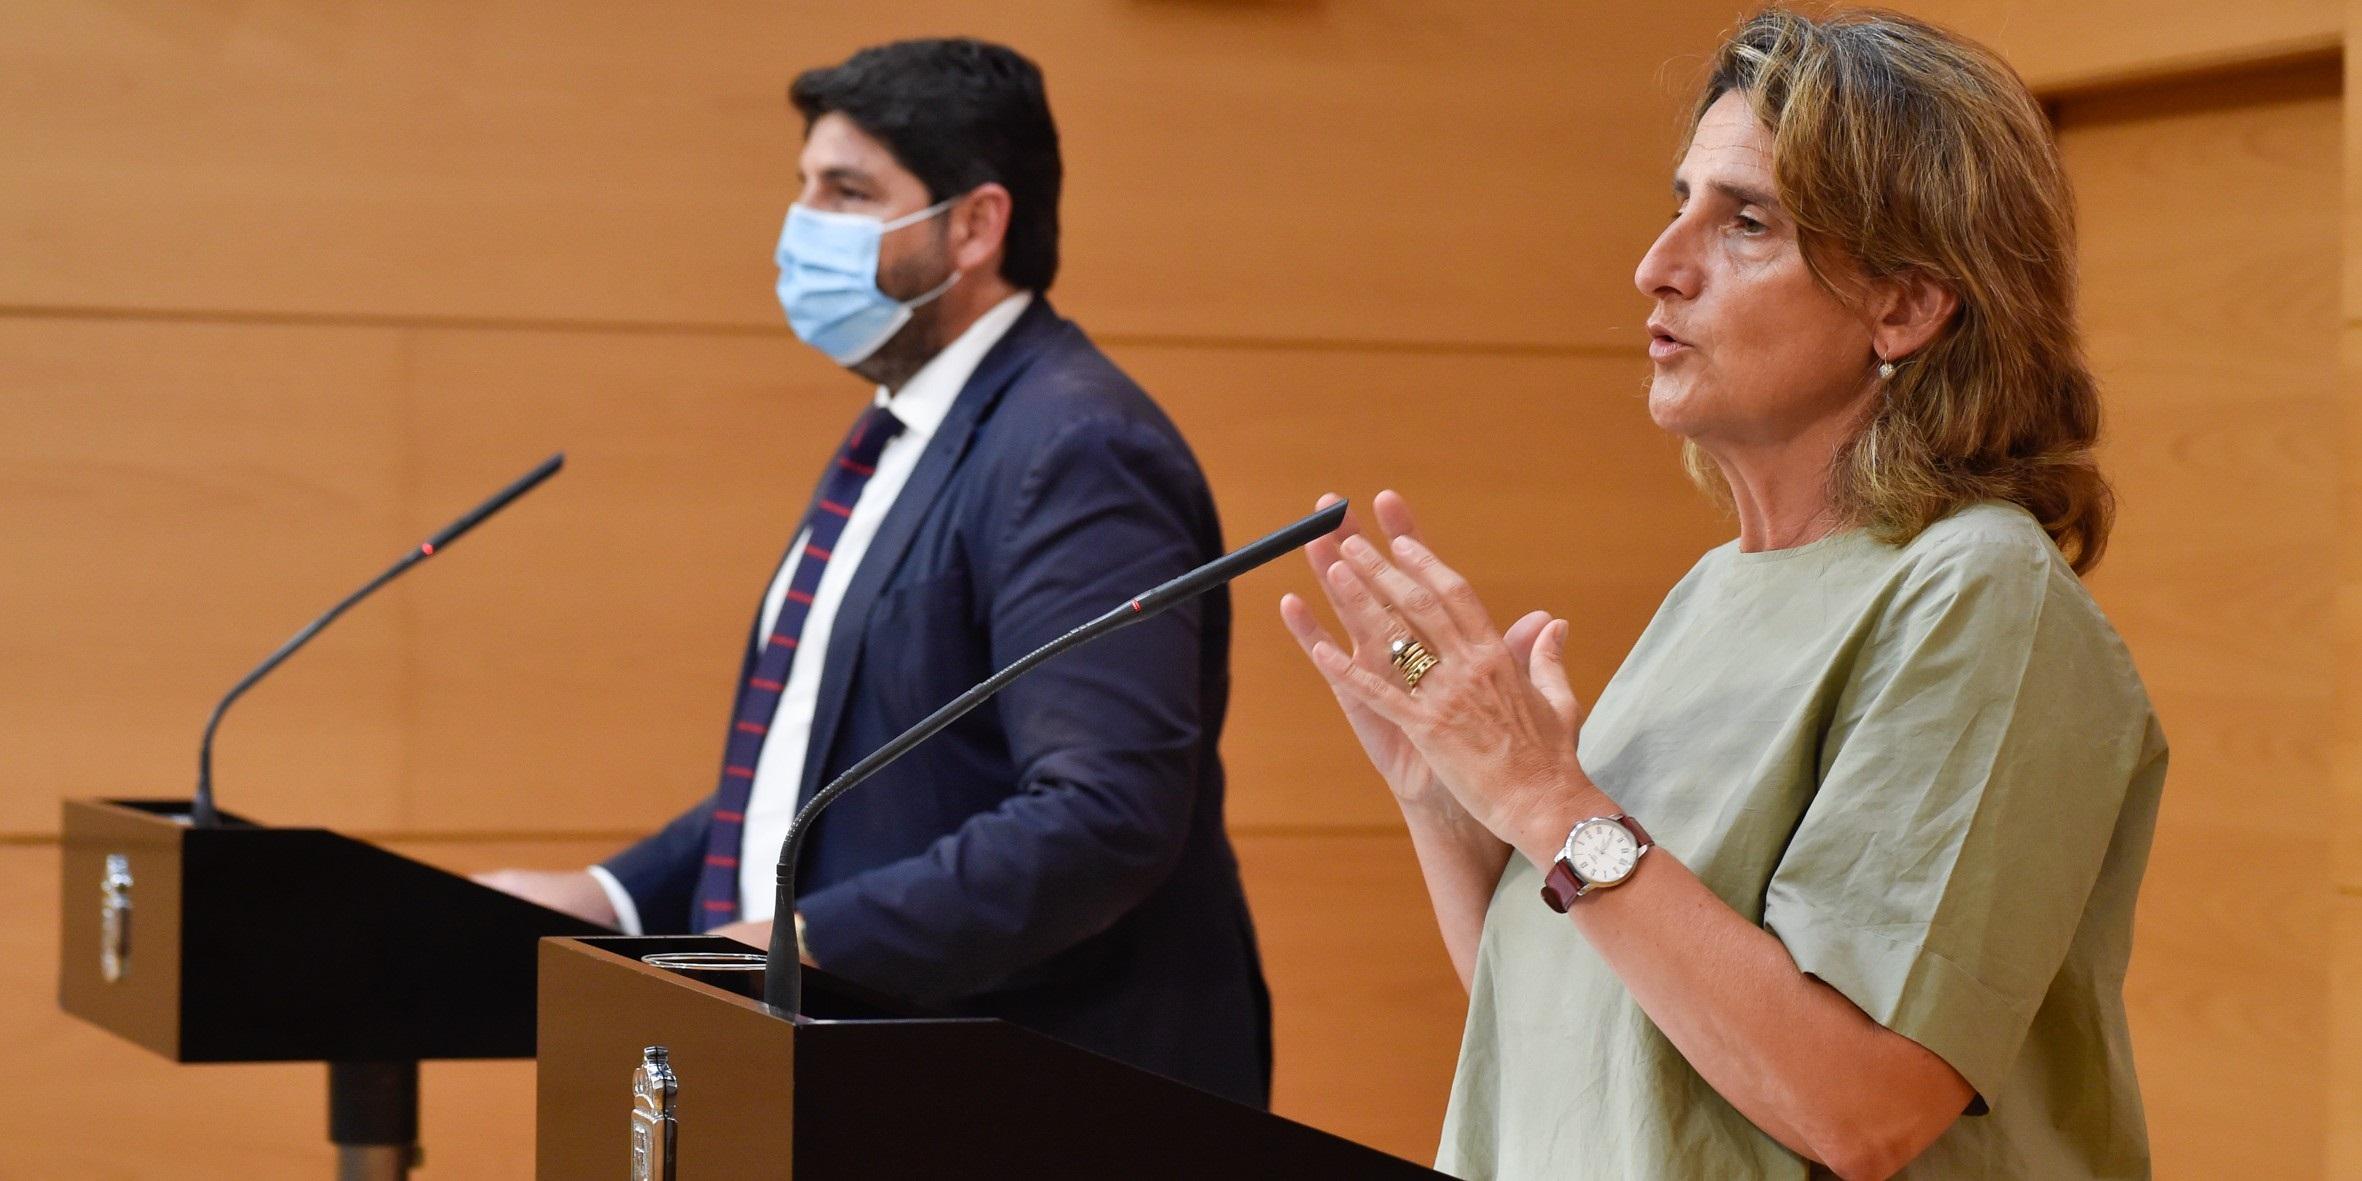 La ministra Teresa Ribera se reunió con el presidente murciano, Fernando López Miras. / EP